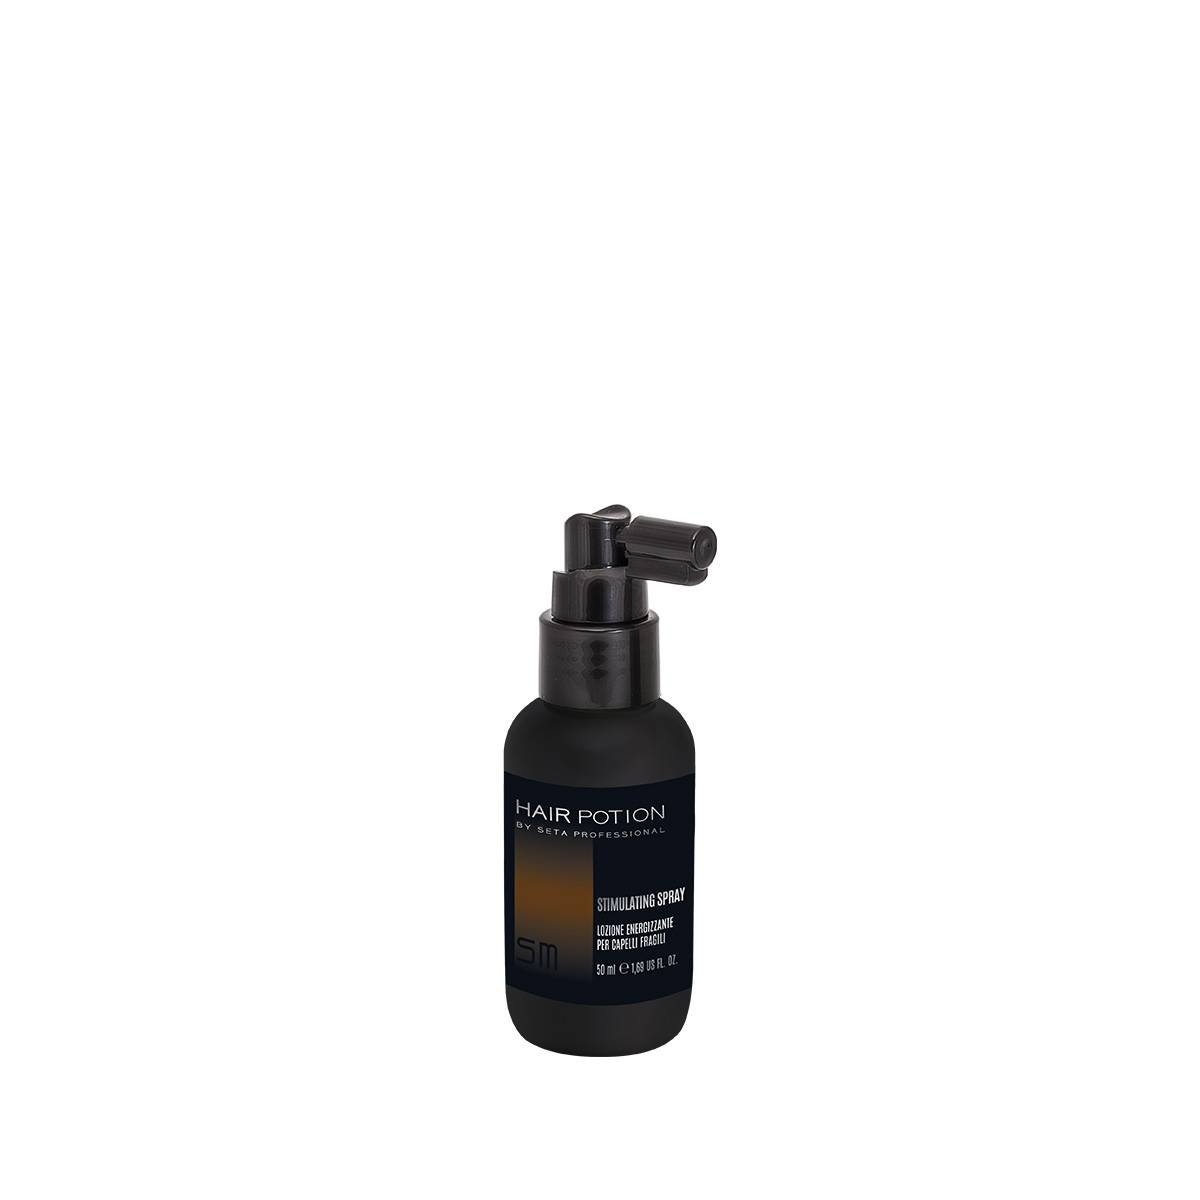 Hair Potion Pro Stimulating Spray 50ml